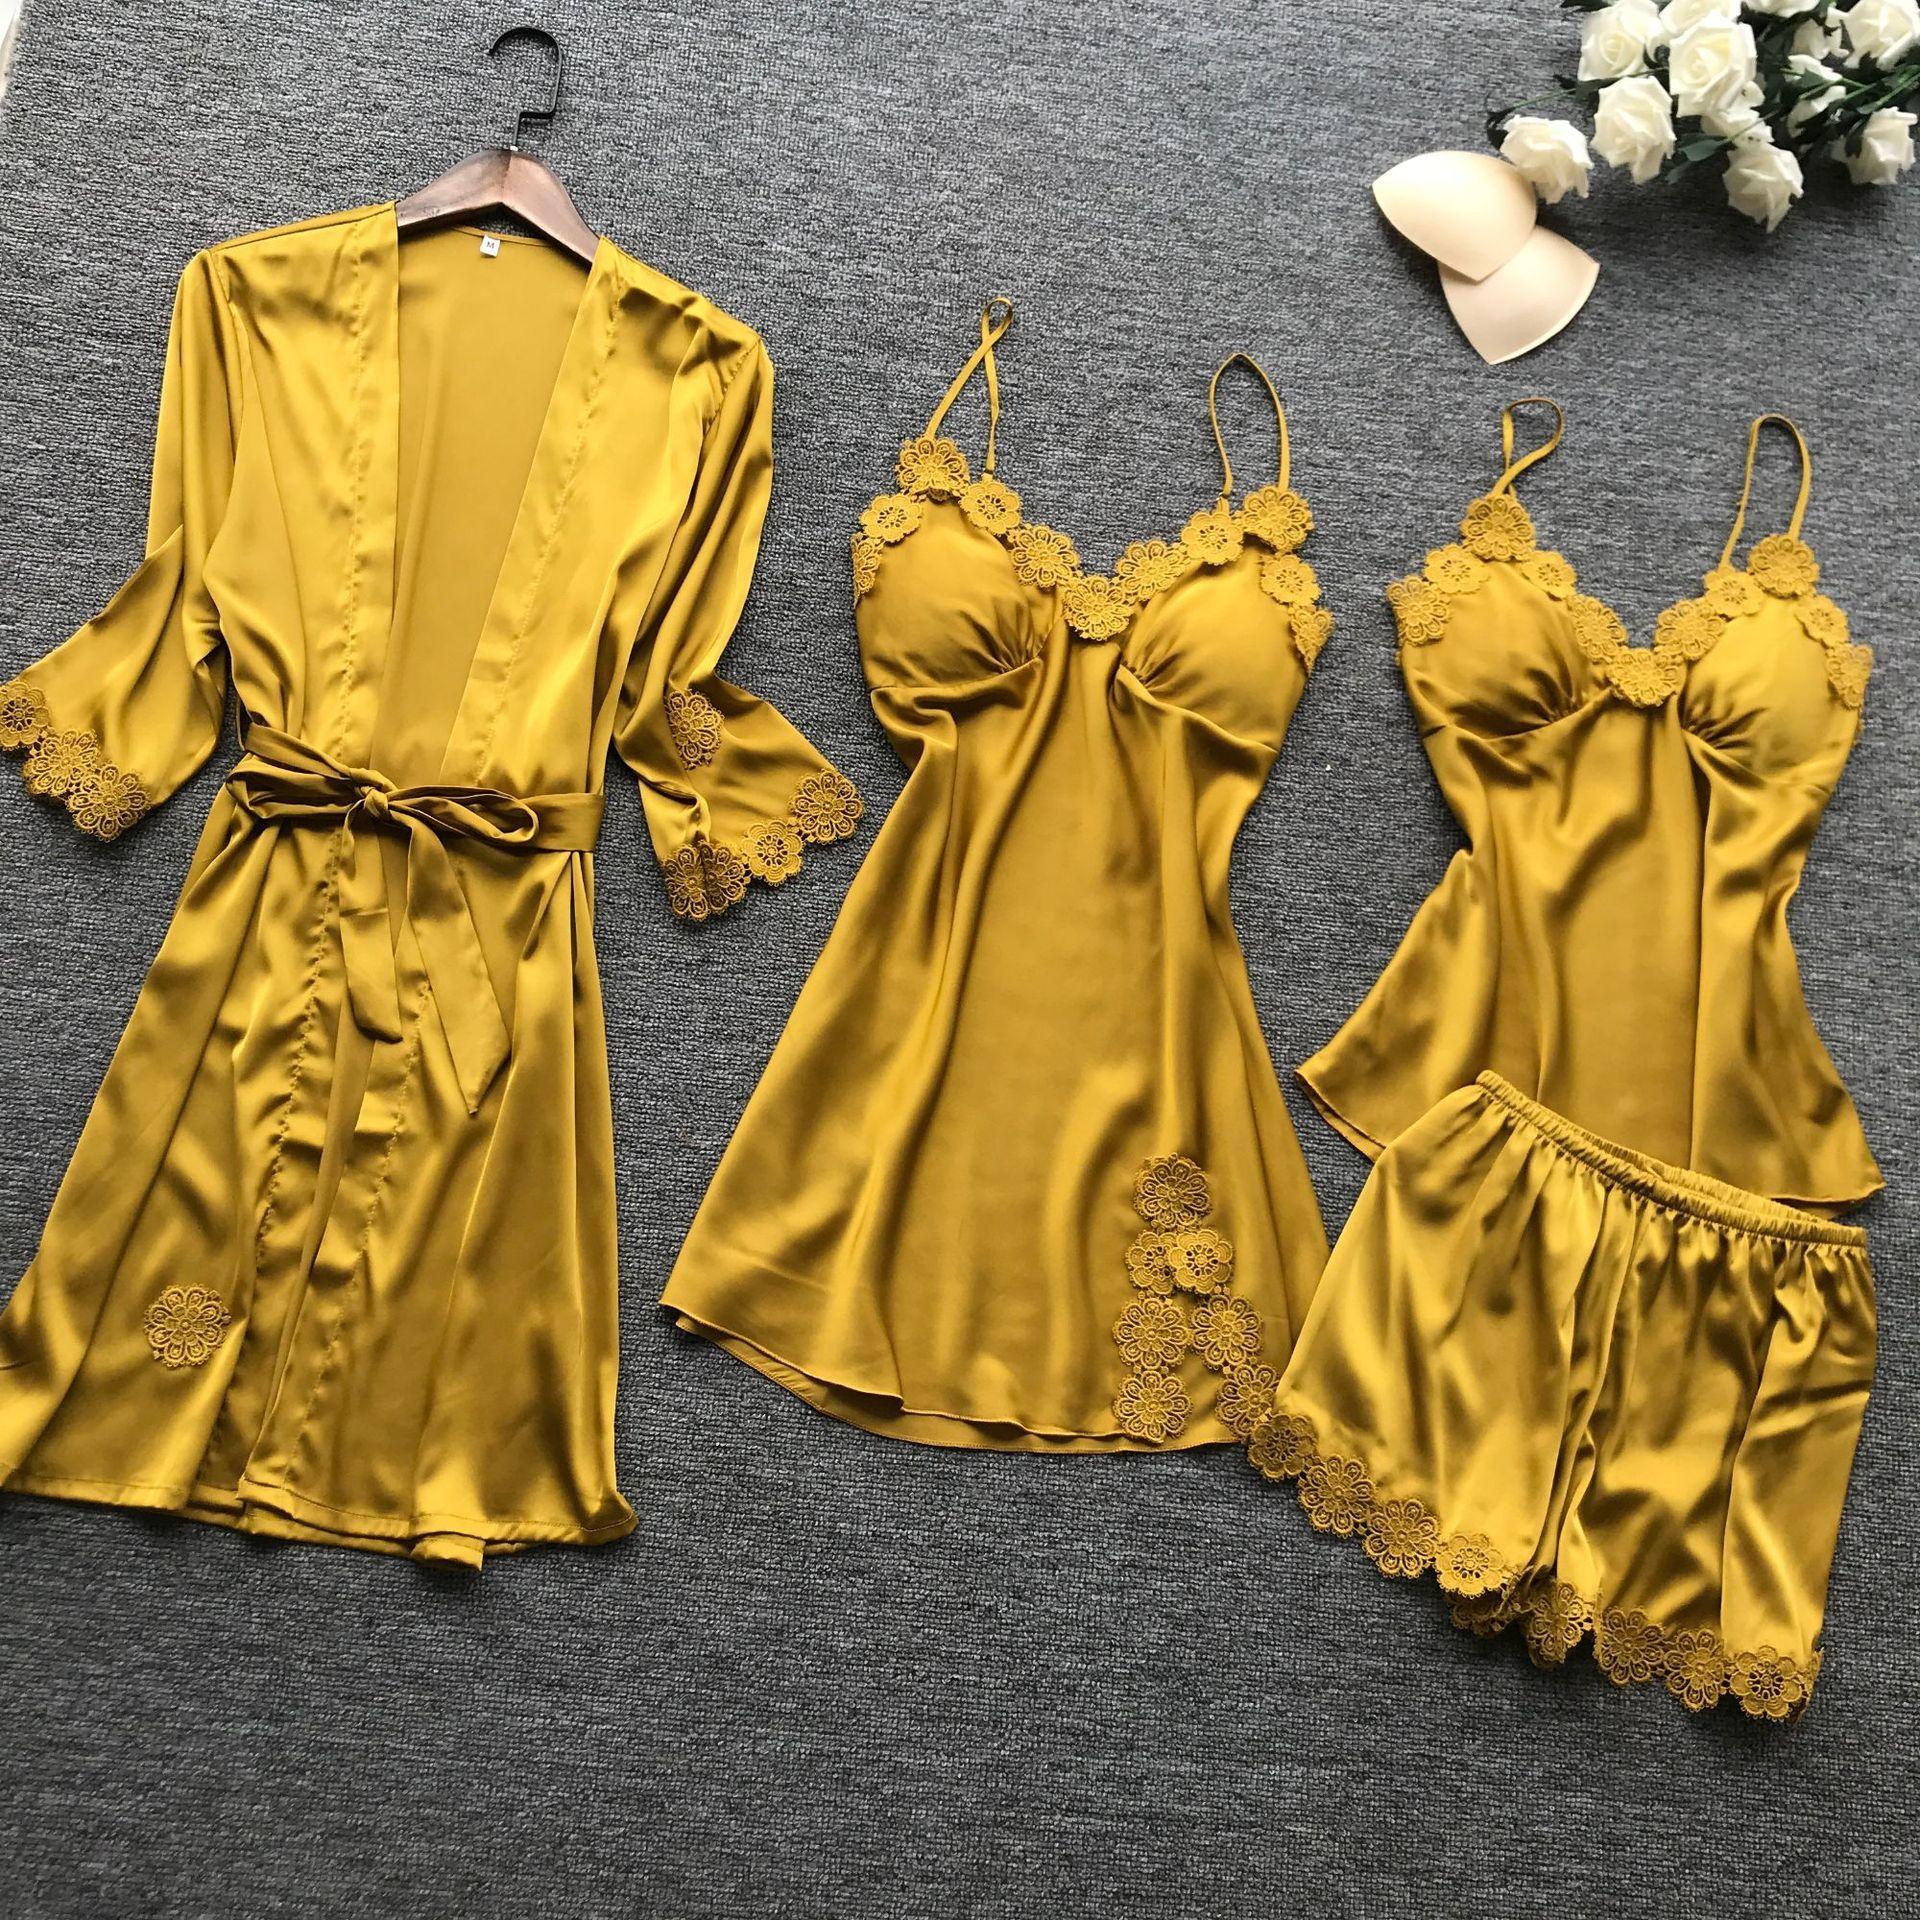 Summer New 4 Pcs Set Women Pyjama Stain High Quality Lace Sexy Sleepwear With Chest Pad Pajamas